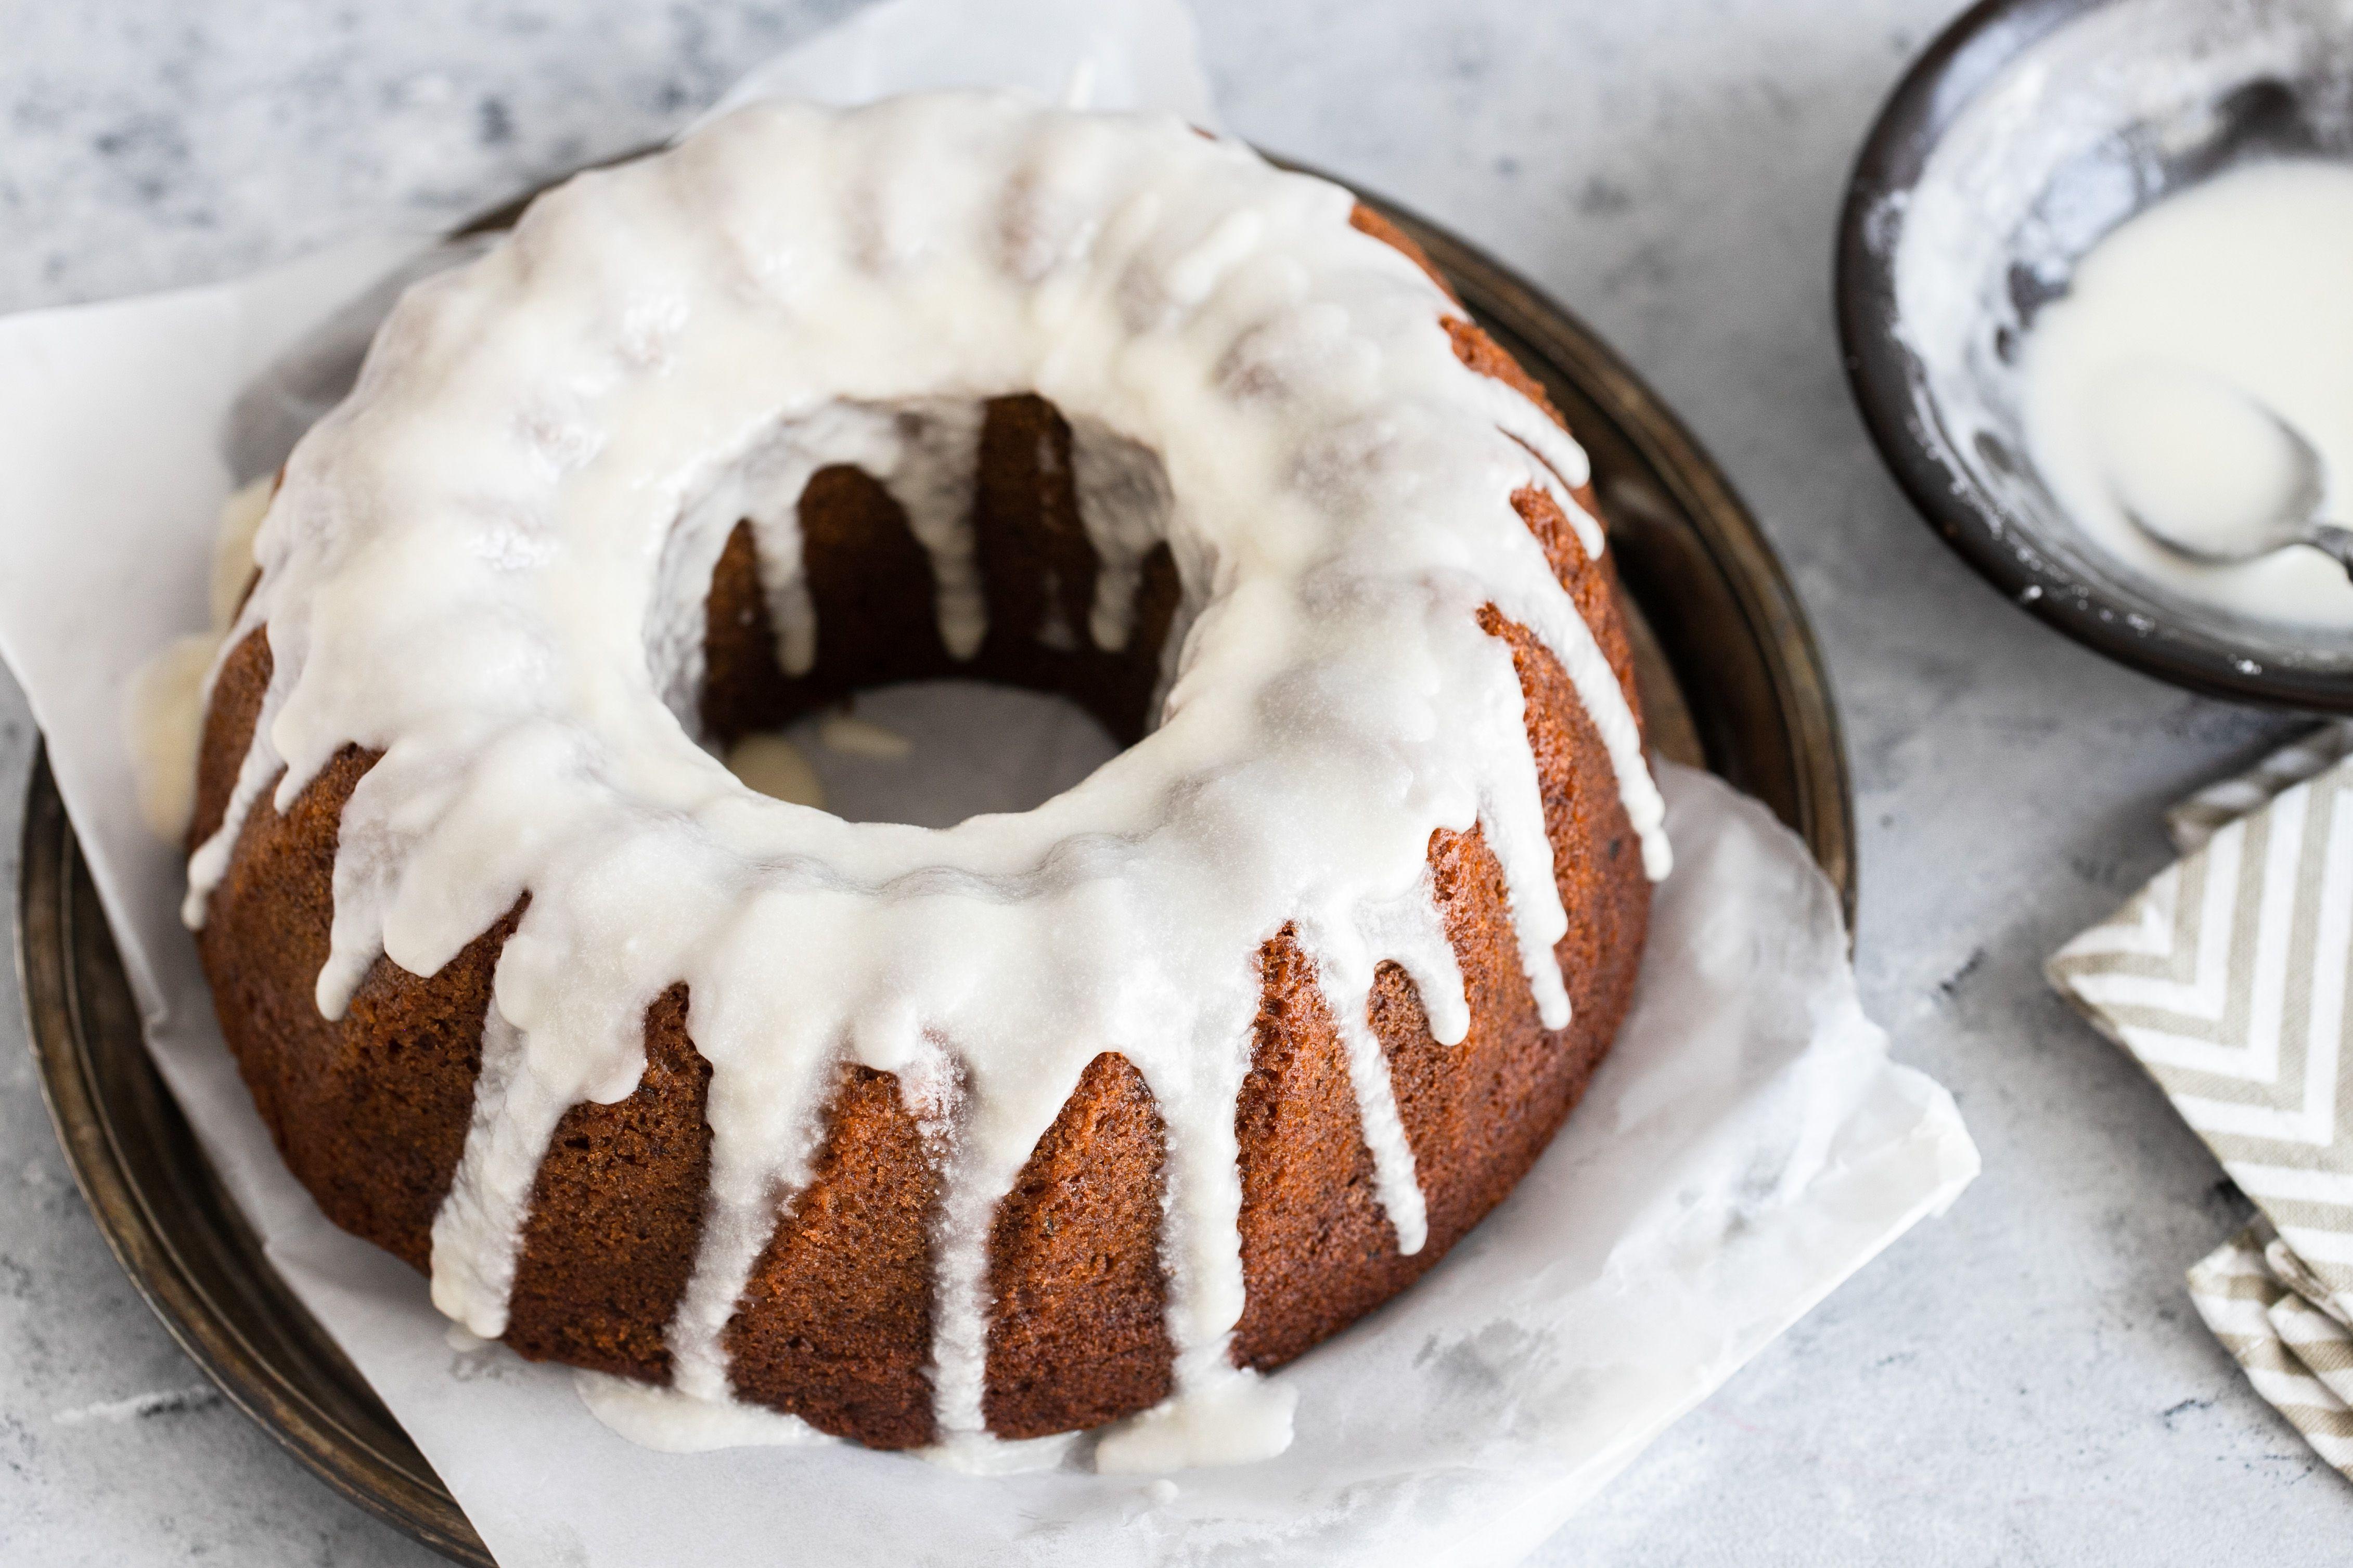 Vanilla icing over Bundt cake